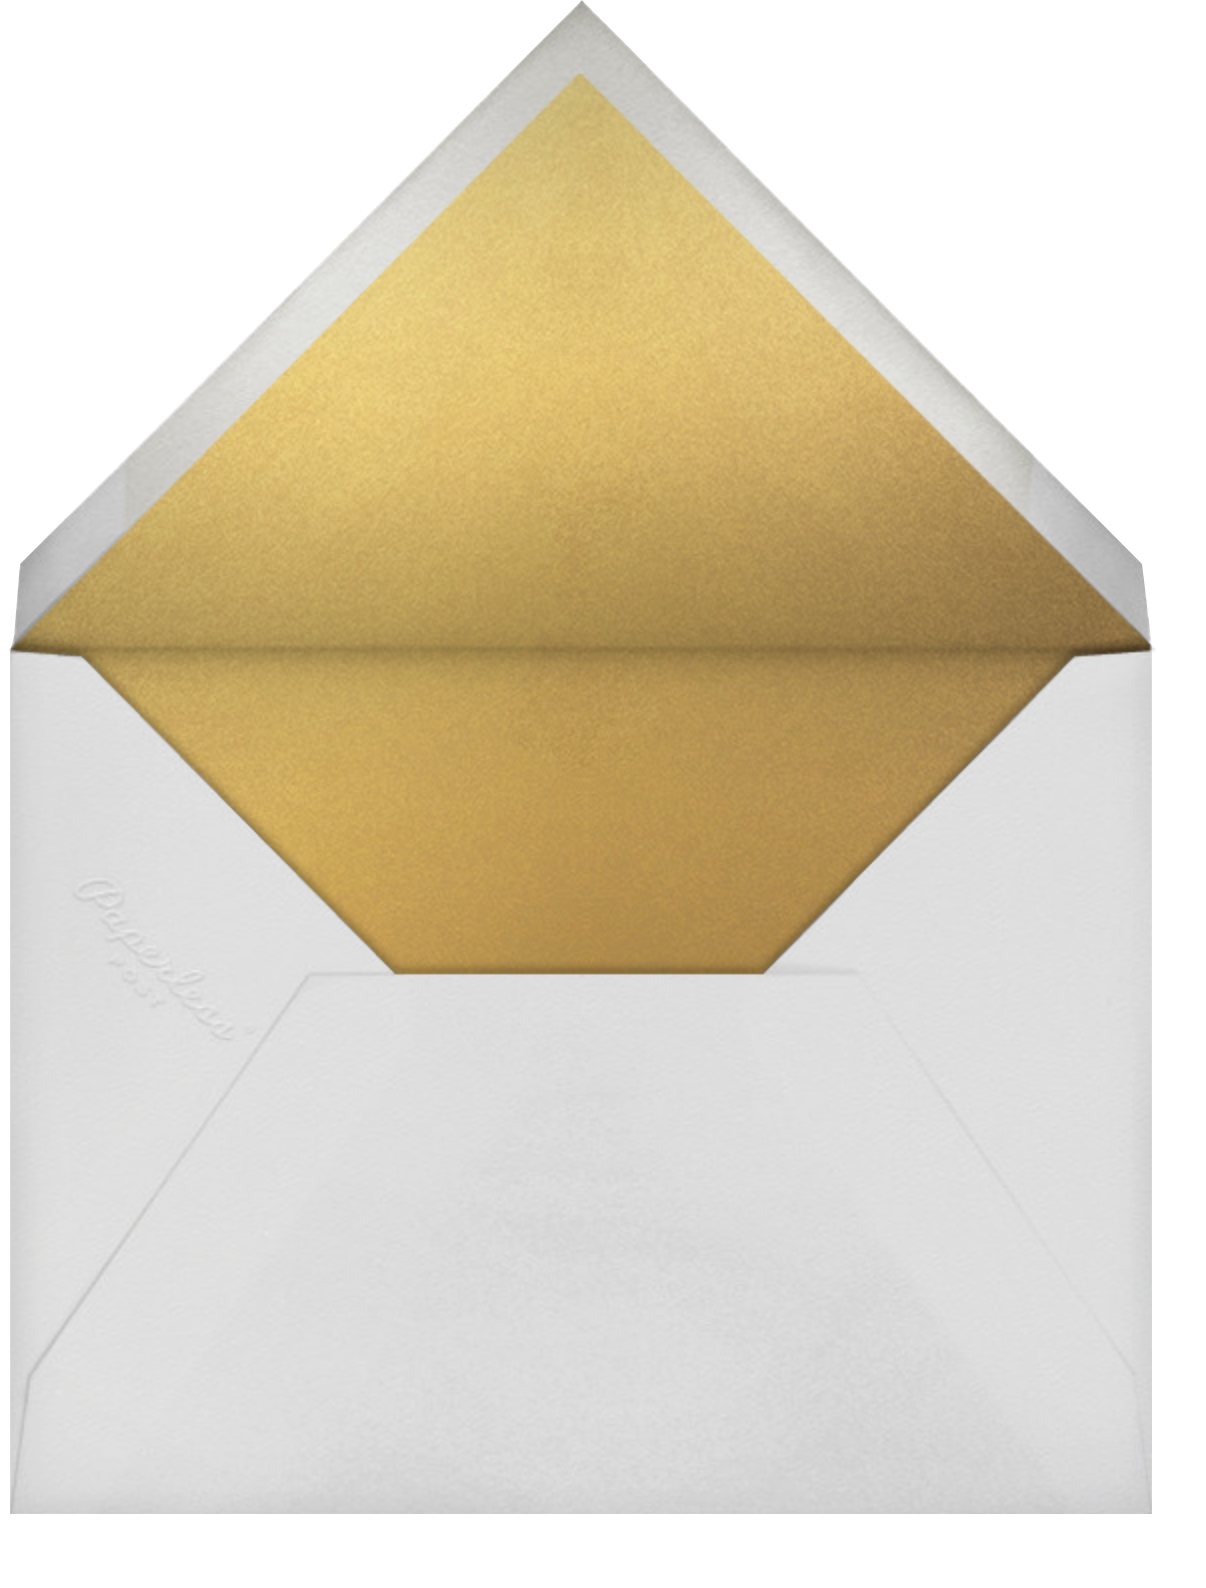 Blossoms on Tulle II - Medium Gold - Oscar de la Renta - All - envelope back